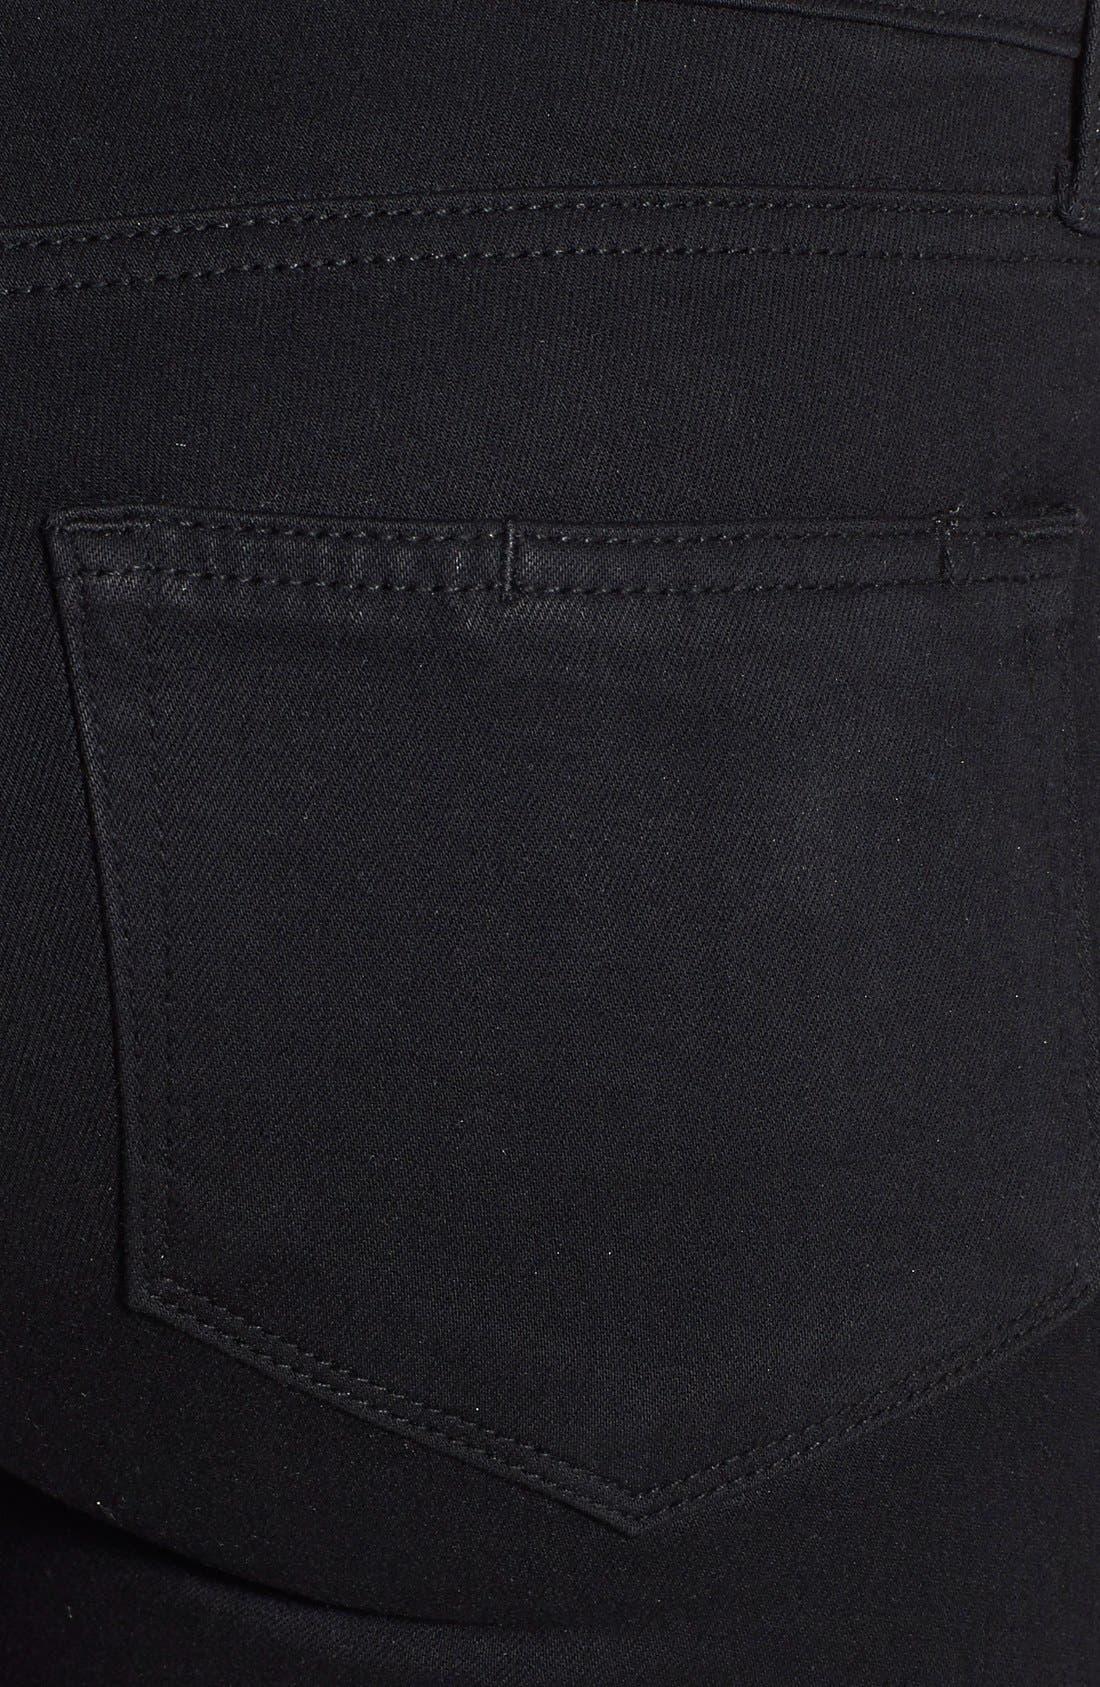 Transcend - Skyline Skinny Jeans,                             Alternate thumbnail 11, color,                             BLACK SHADOW